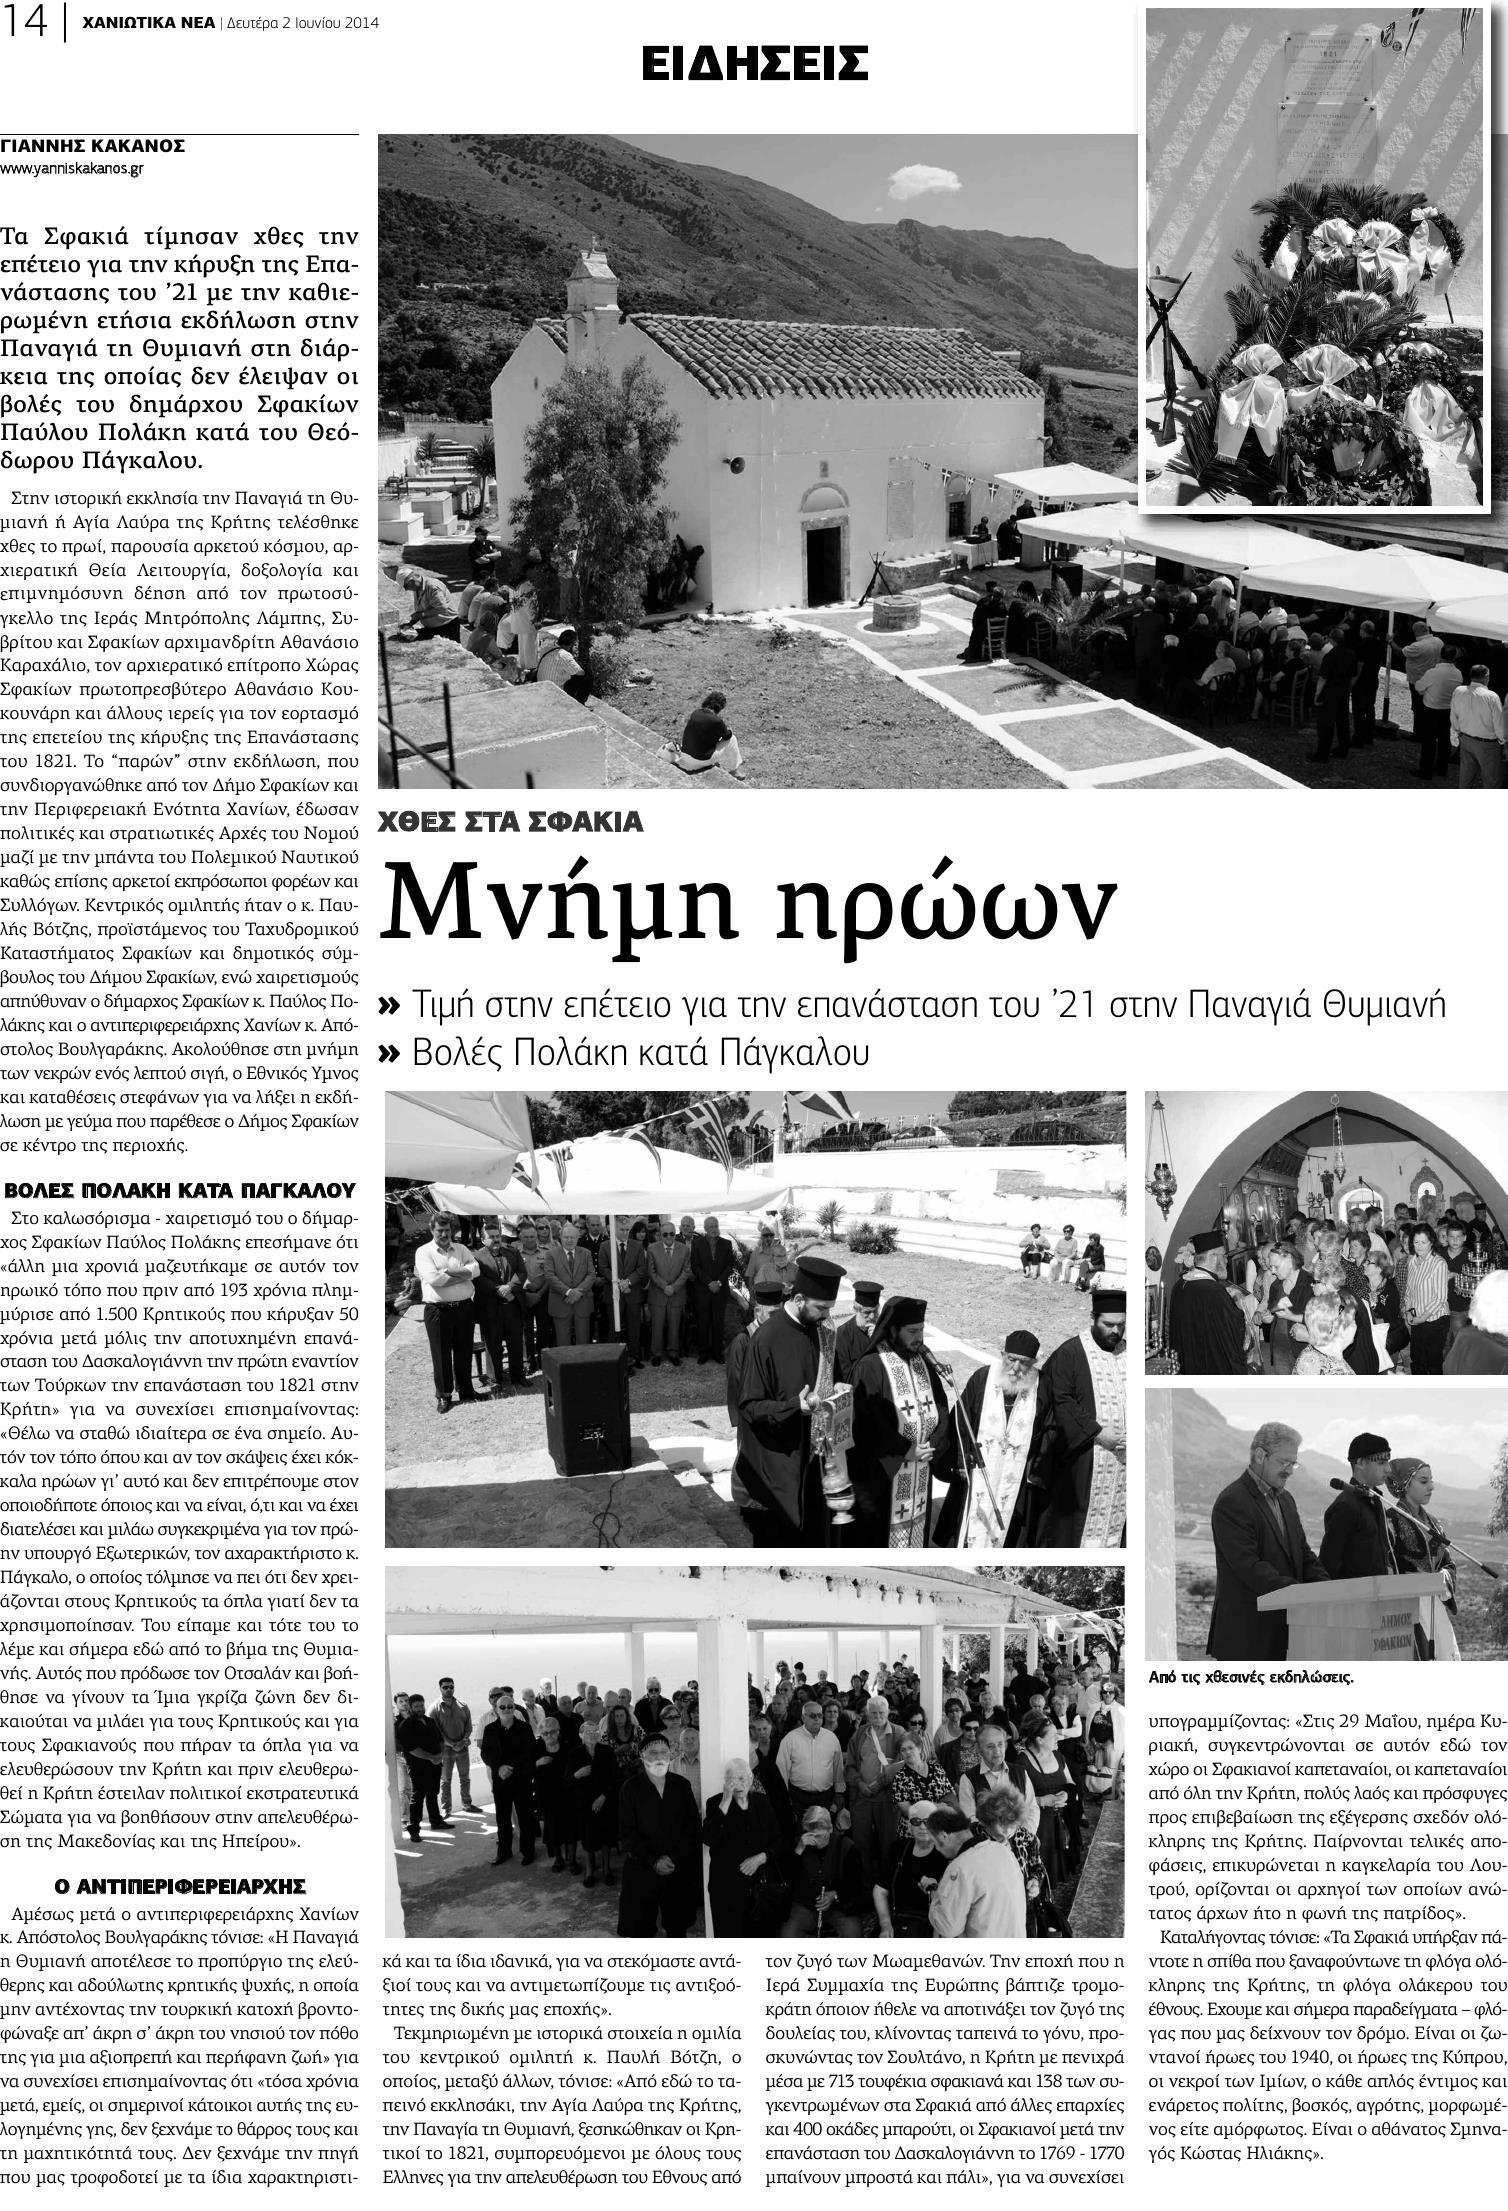 56pp_14-20140602